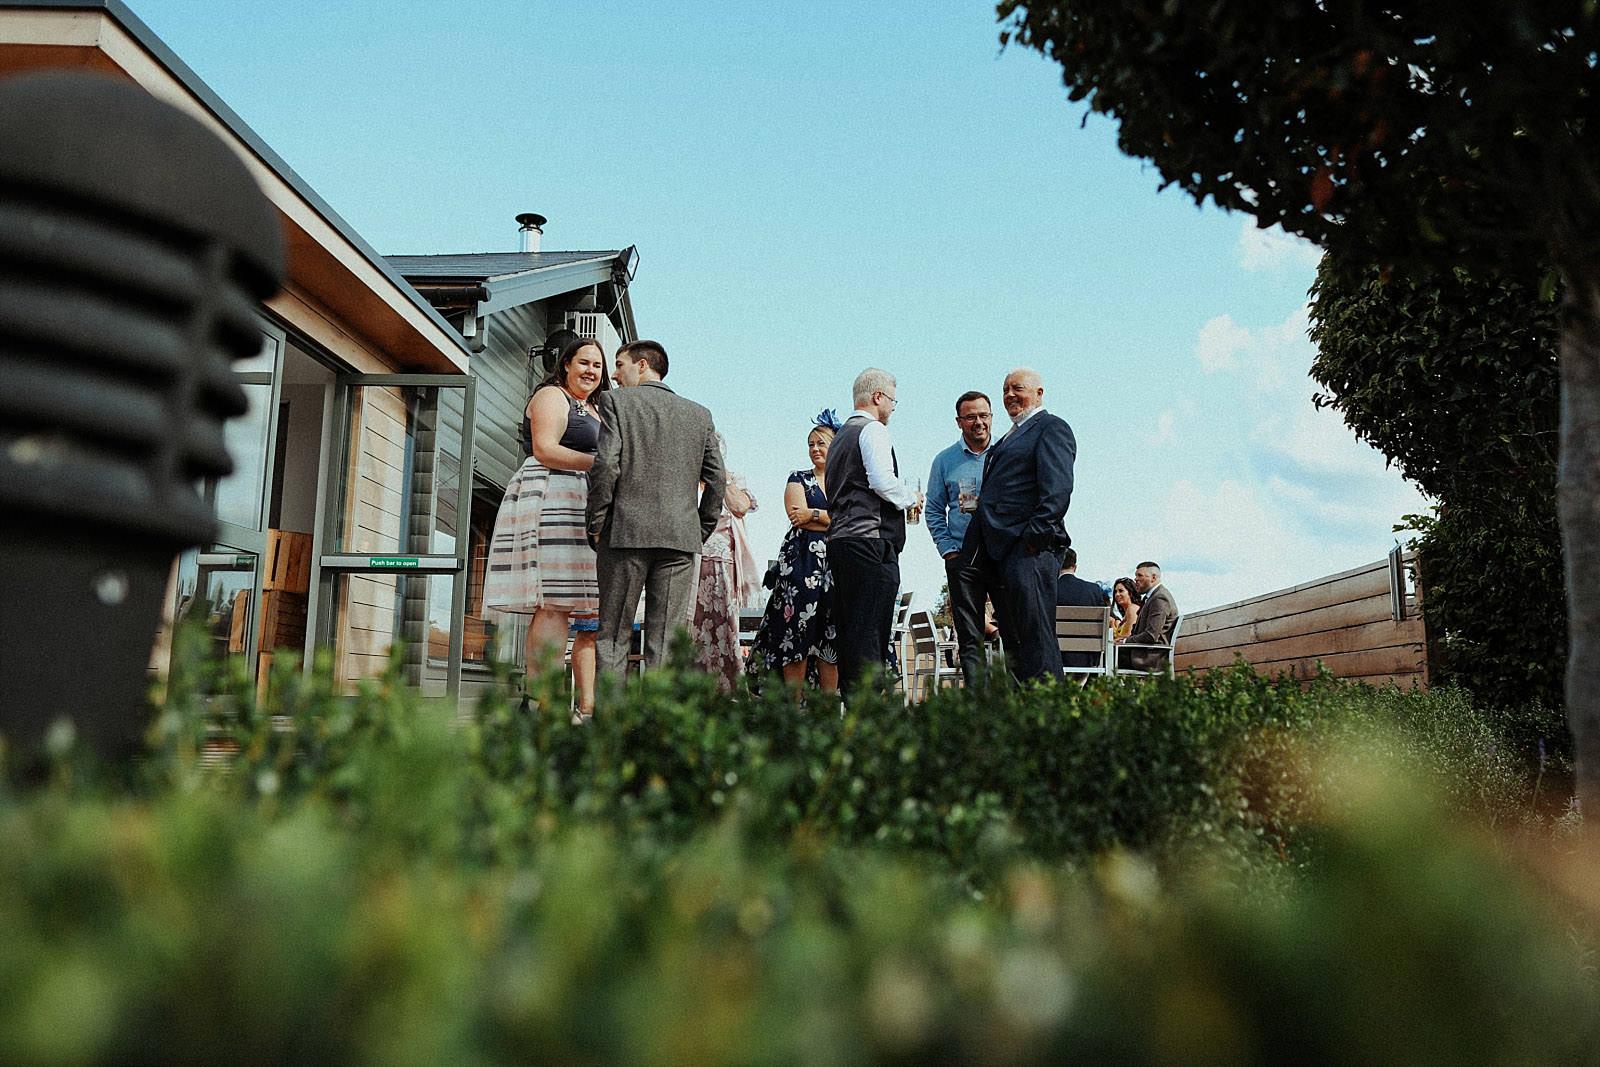 weddings guests congregating